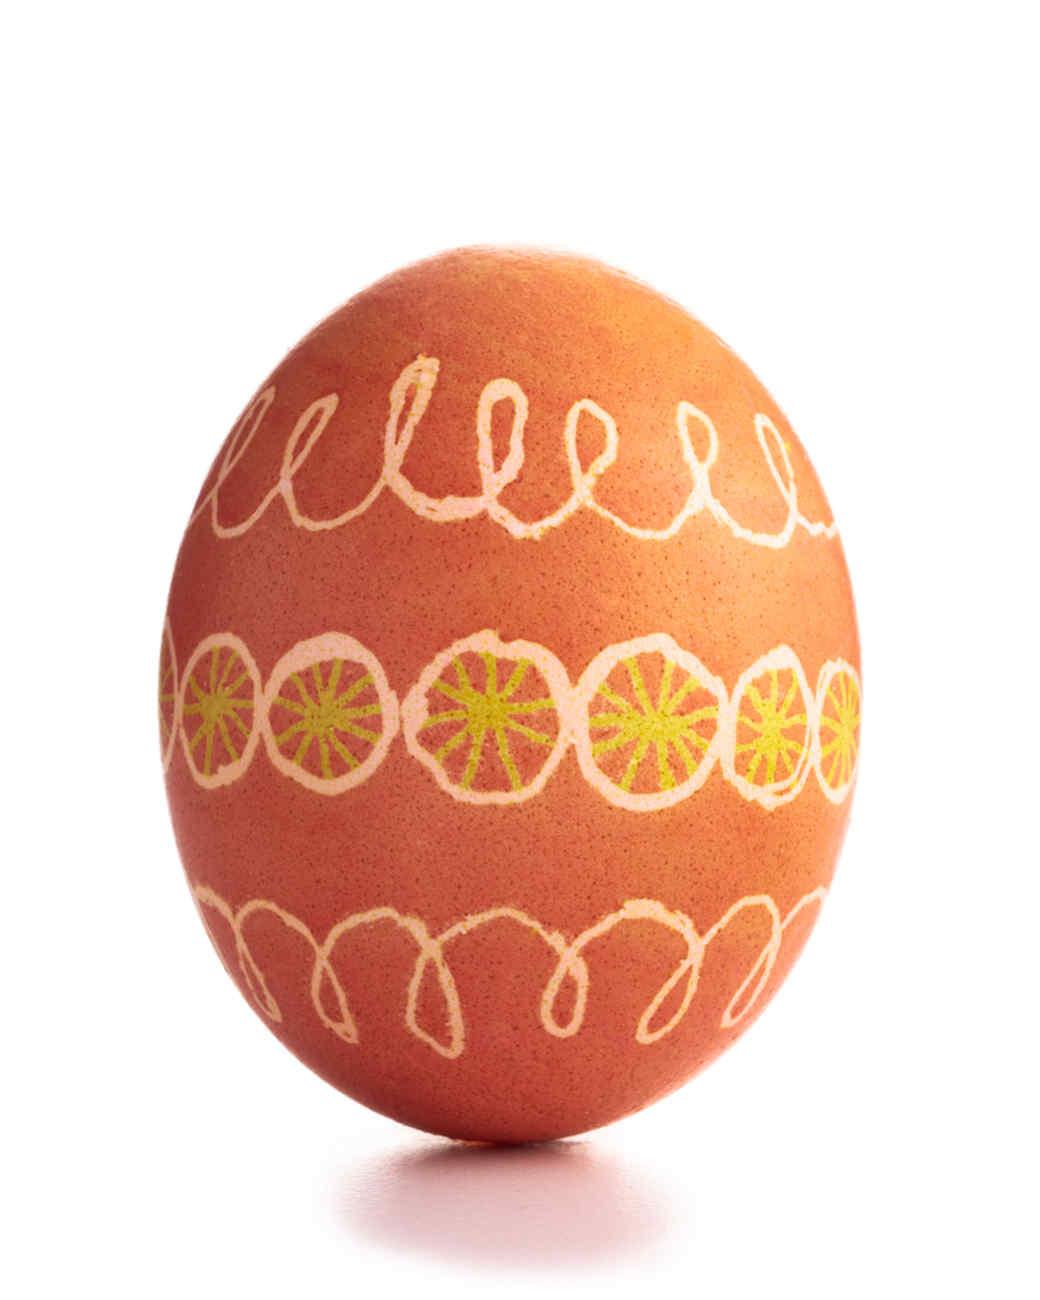 egg-dyeing-app-d107182-wax-stylus-oranges0414.jpg